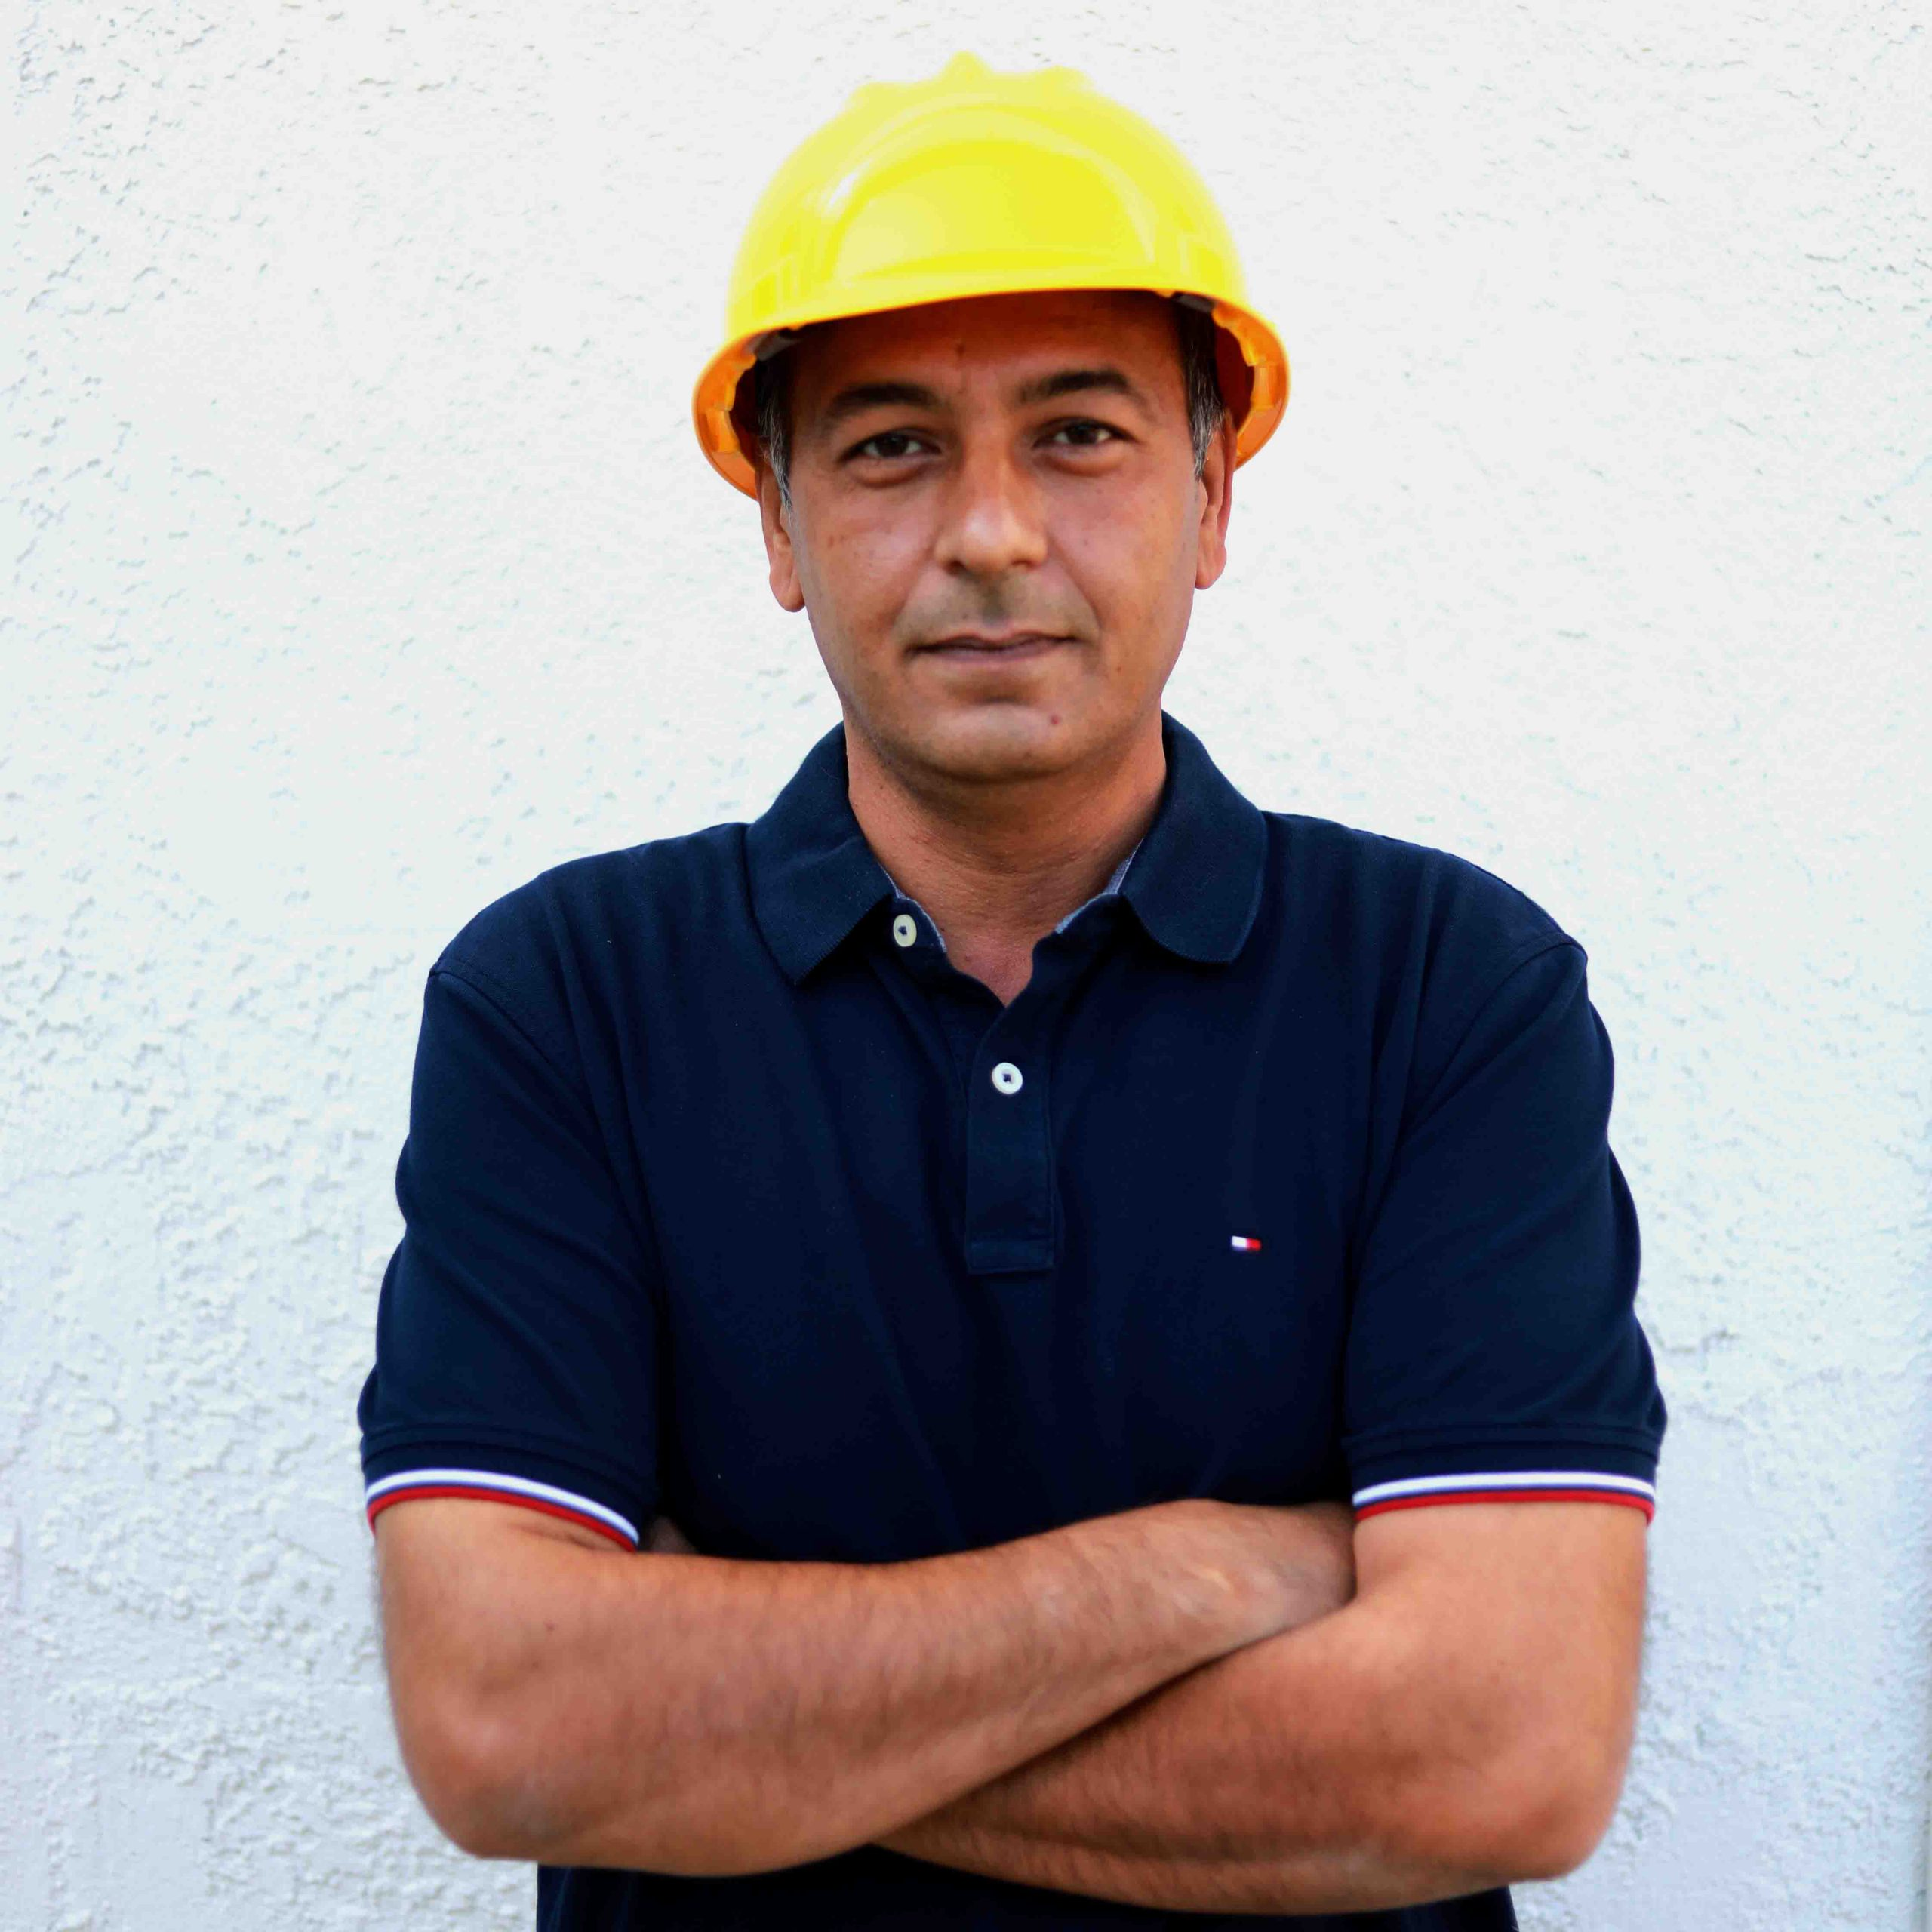 https://fbrconstruction.com/wp-content/uploads/2020/11/Farhad-Rezazadeh-CEO-scaled.jpg